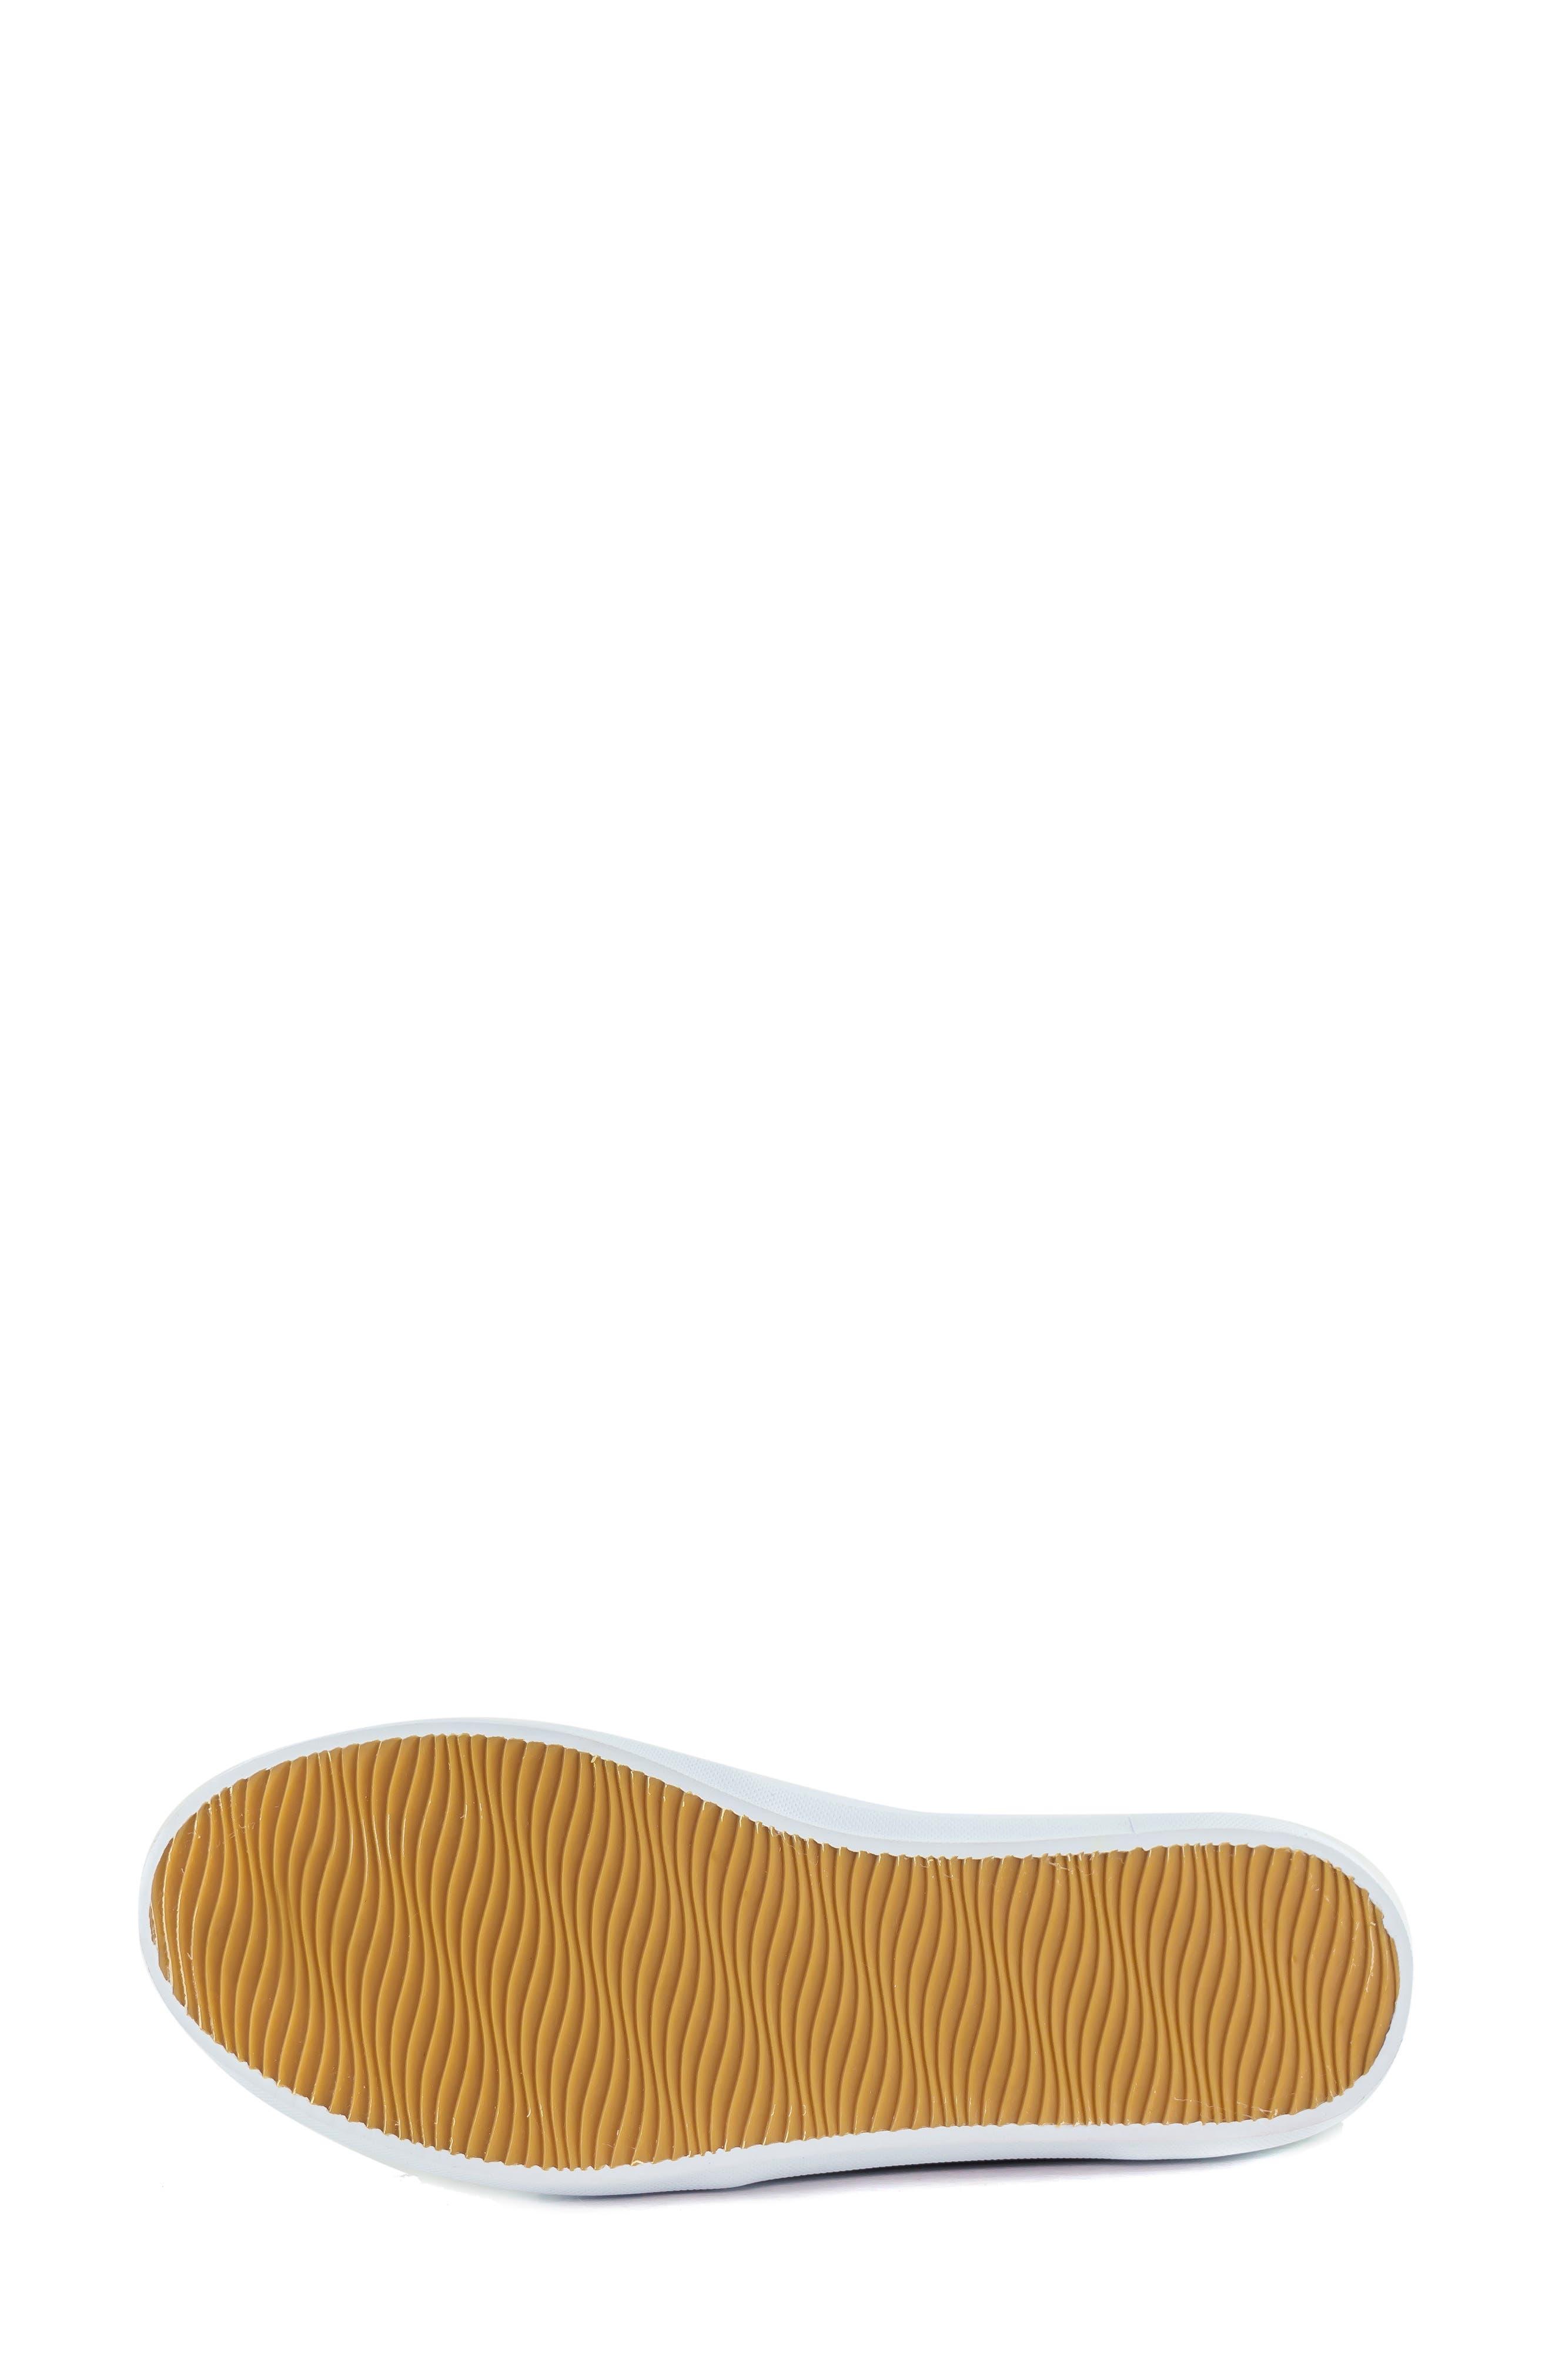 MARC JOSEPH NEW YORK, Soho Sneaker, Alternate thumbnail 6, color, CORAL LEATHER